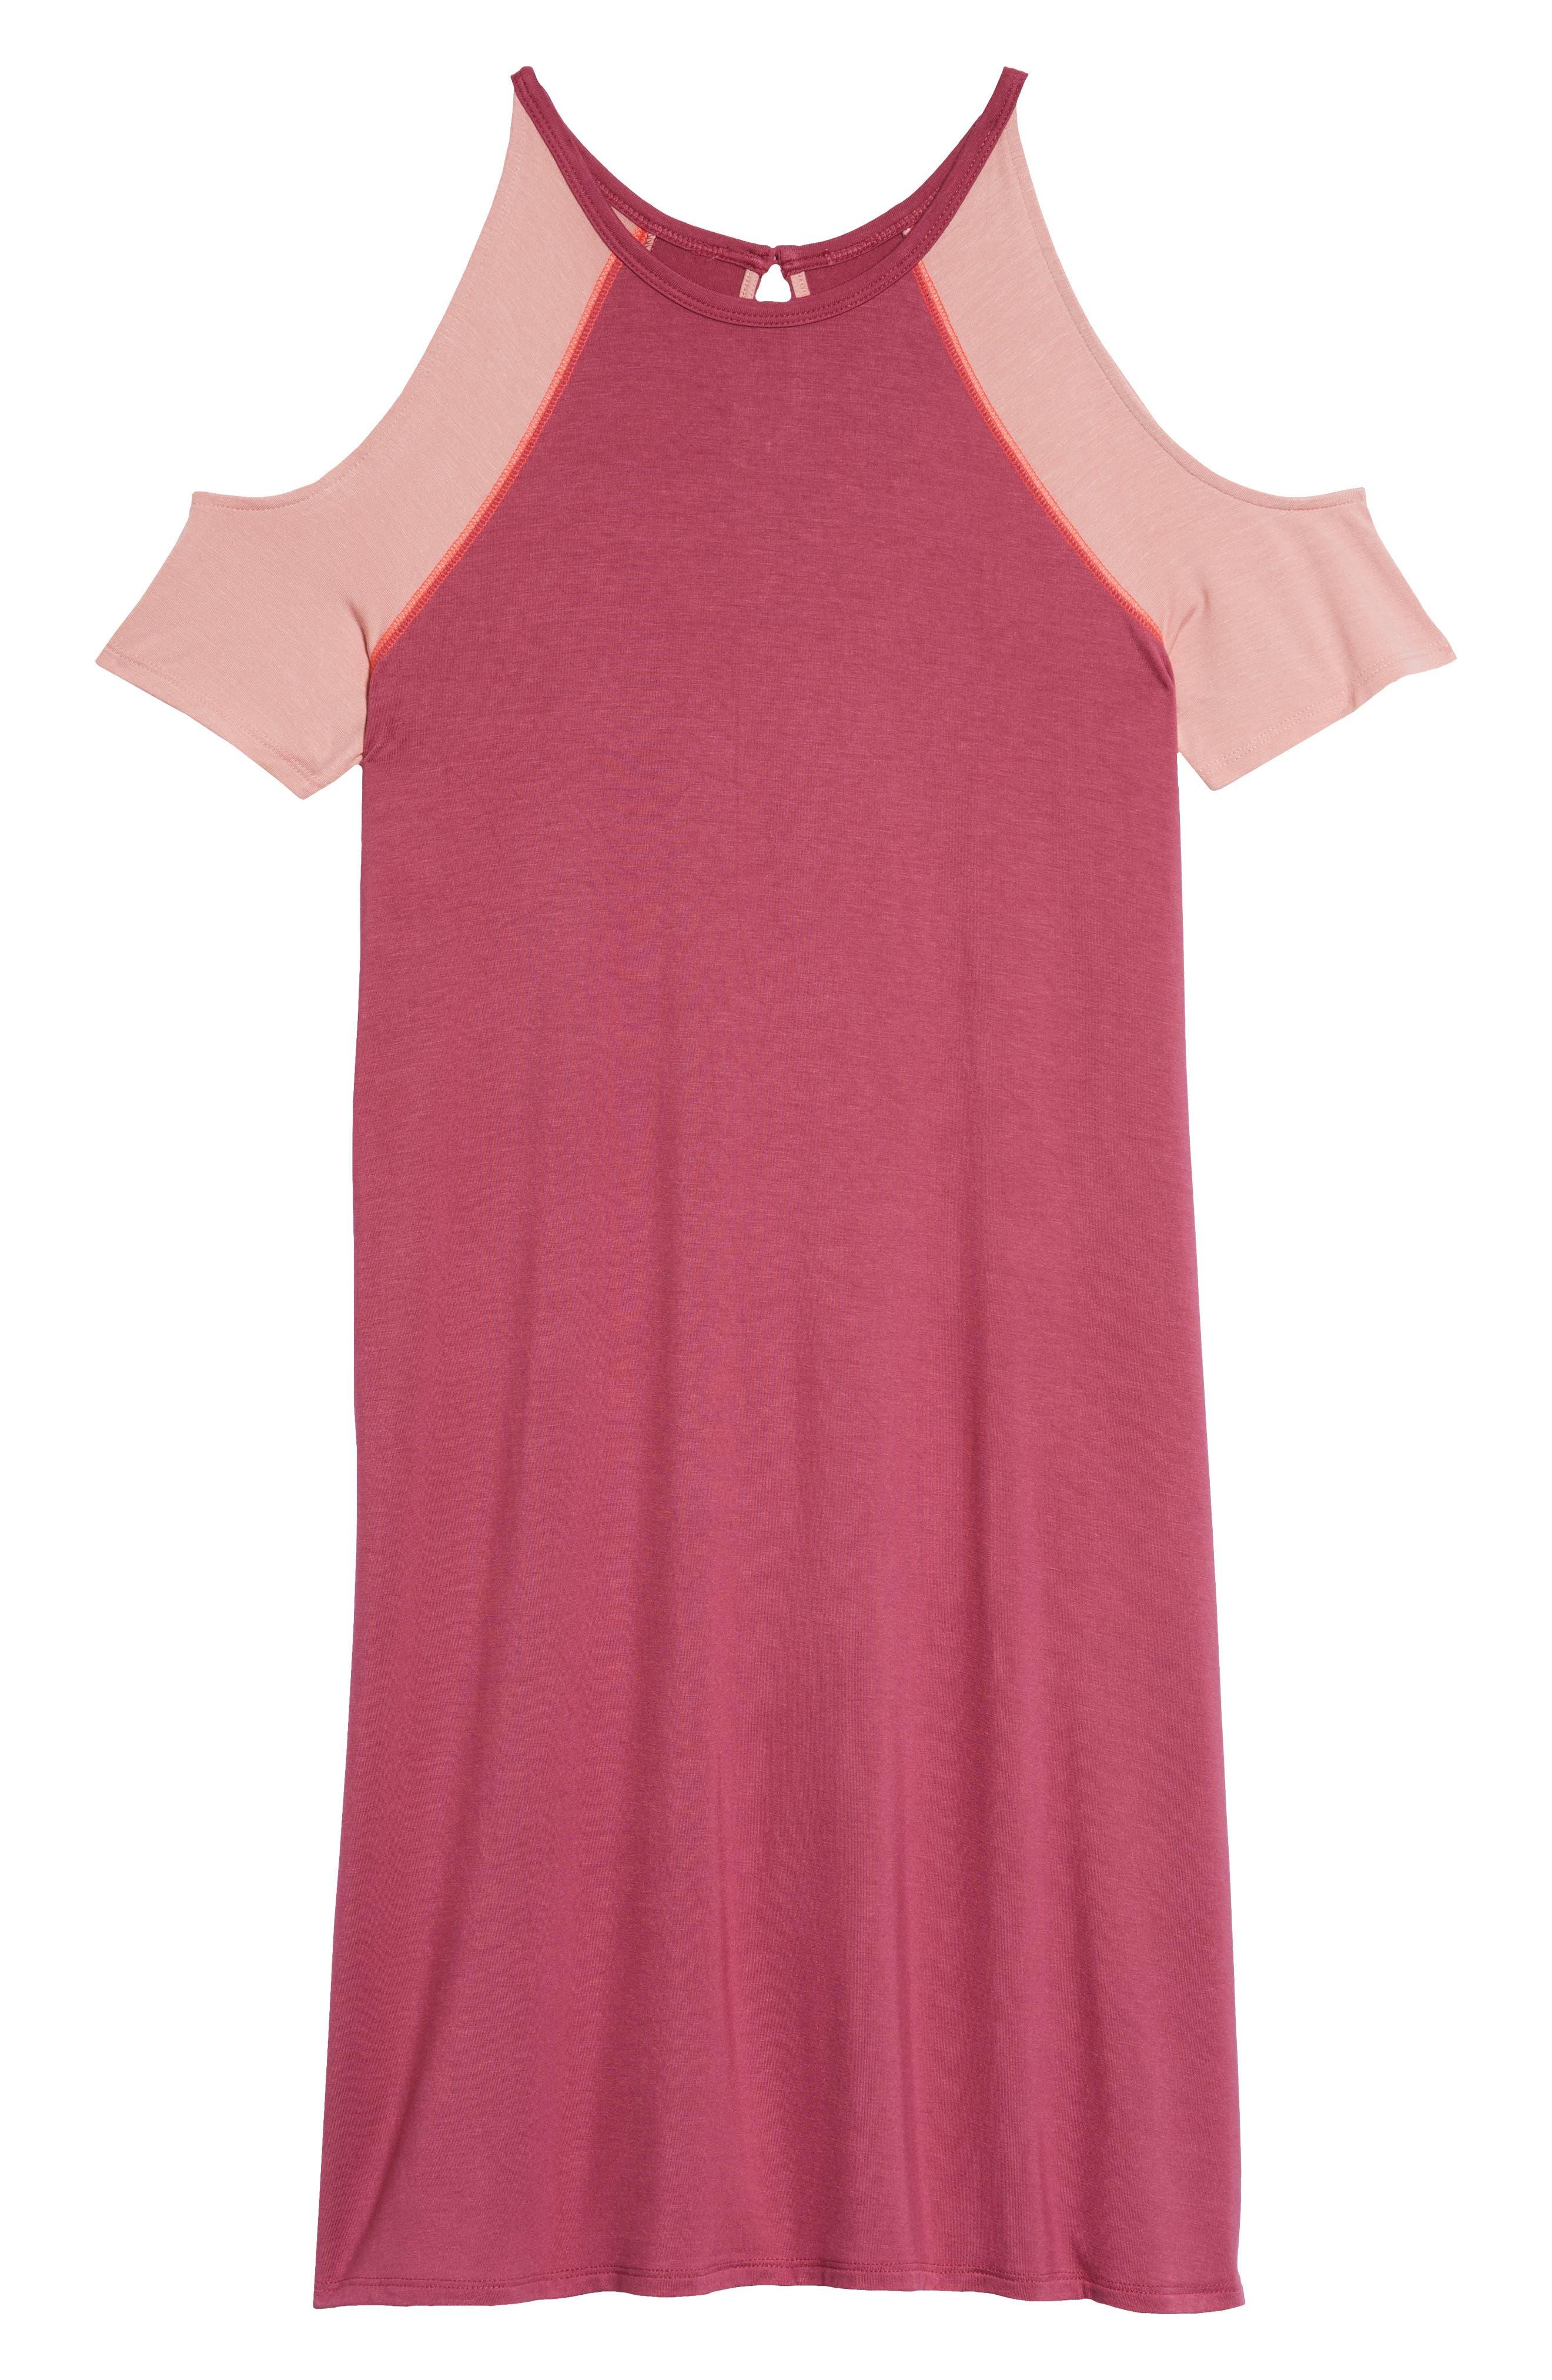 Cold Shoulder Dress,                             Main thumbnail 1, color,                             Magenta Pink